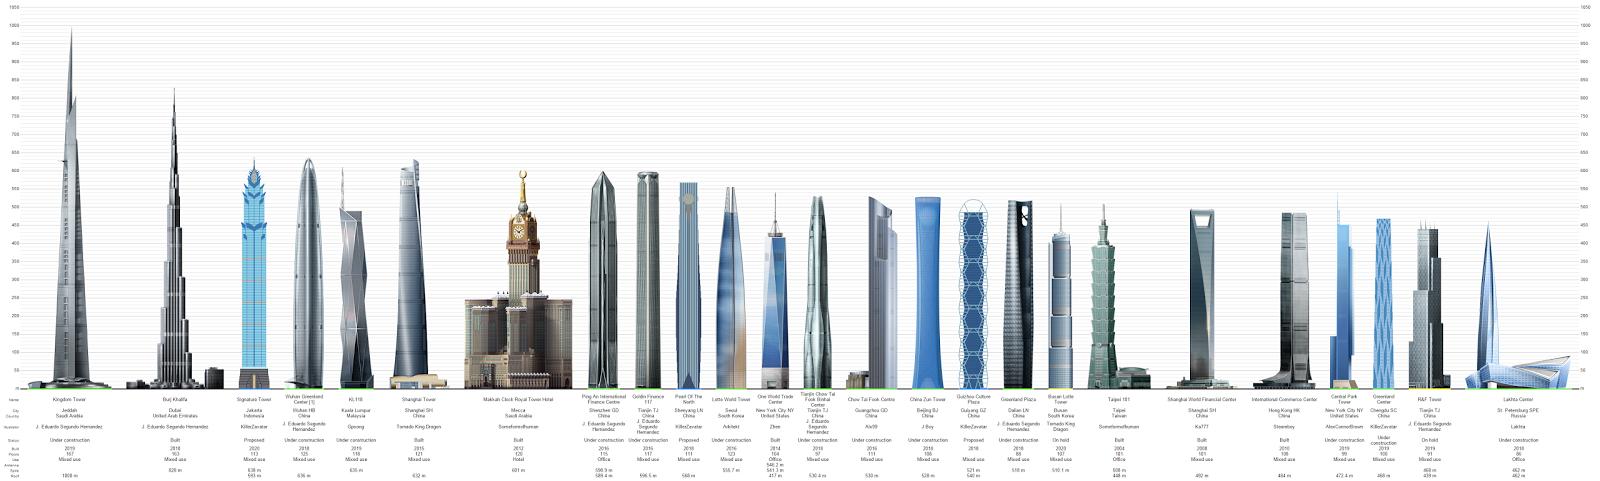 Worlds Tallest Buildings Market Statistic